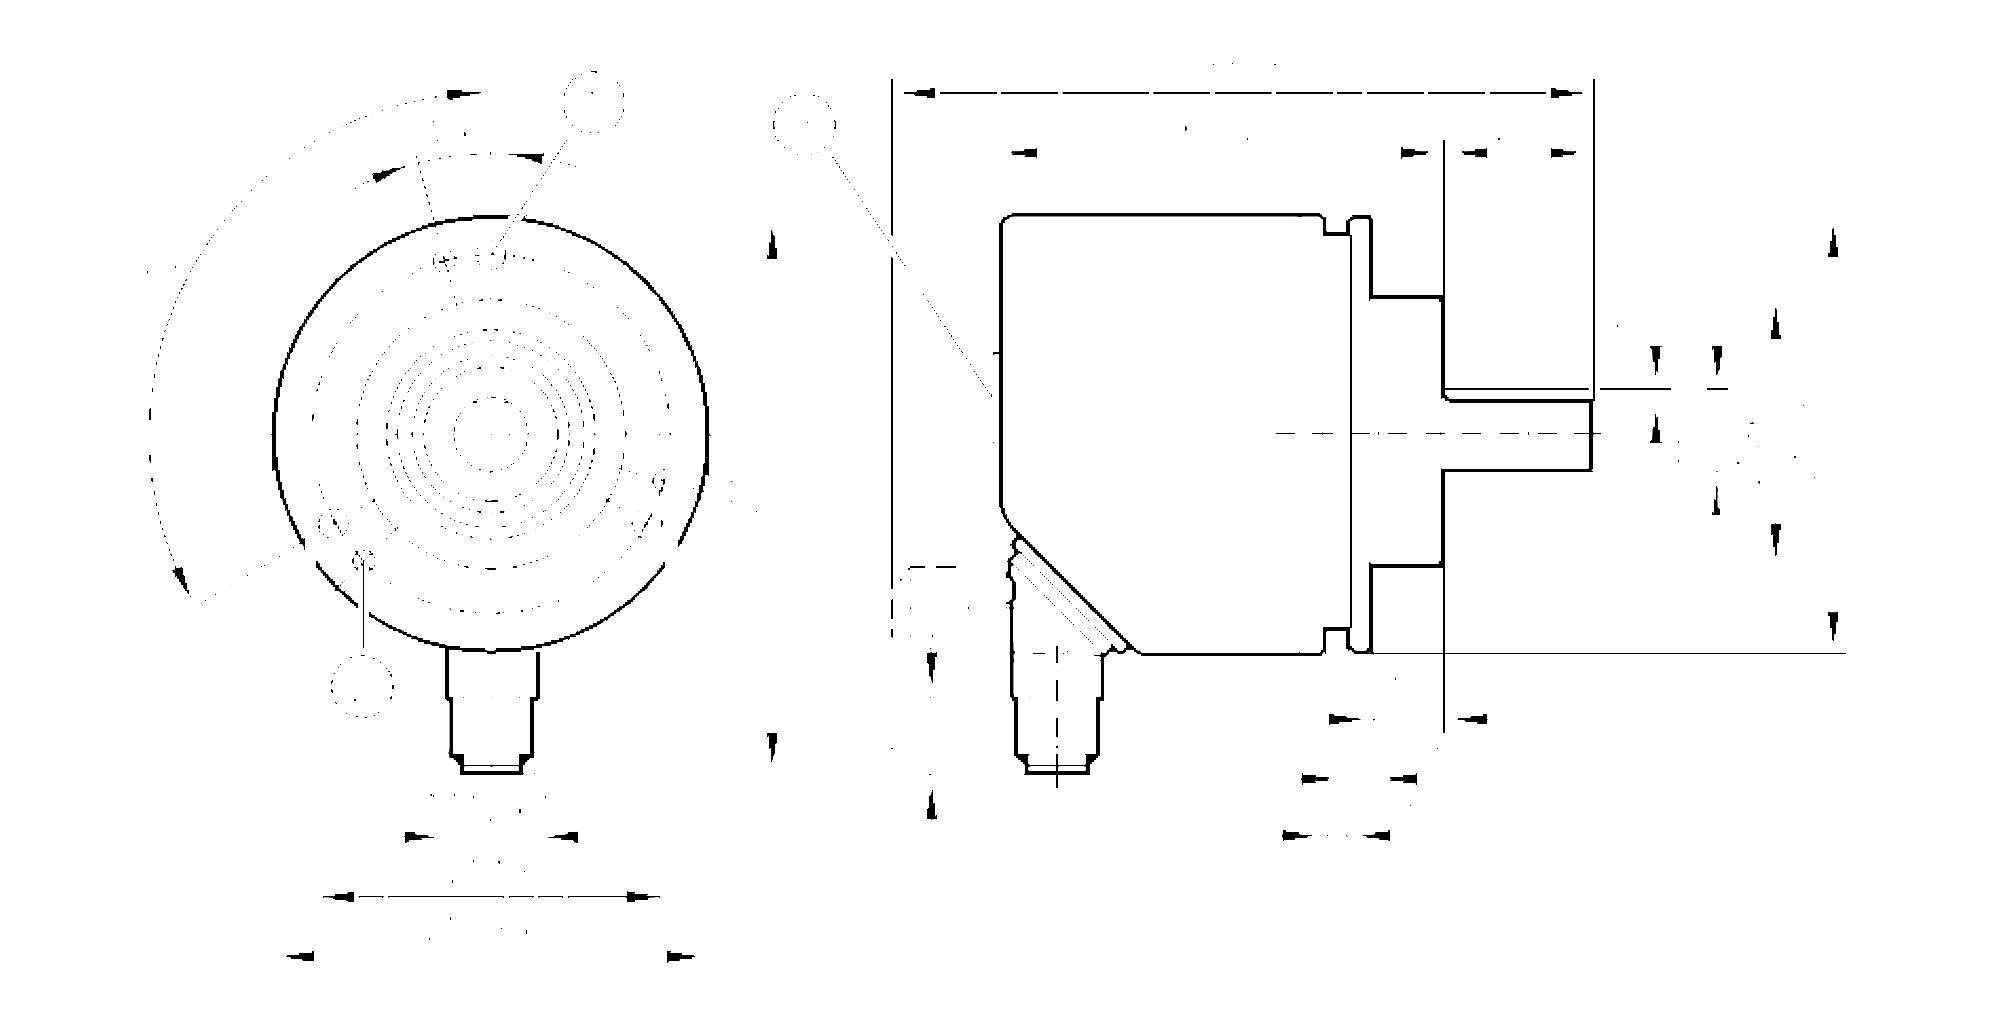 incremental encoder performance line  scale drawing